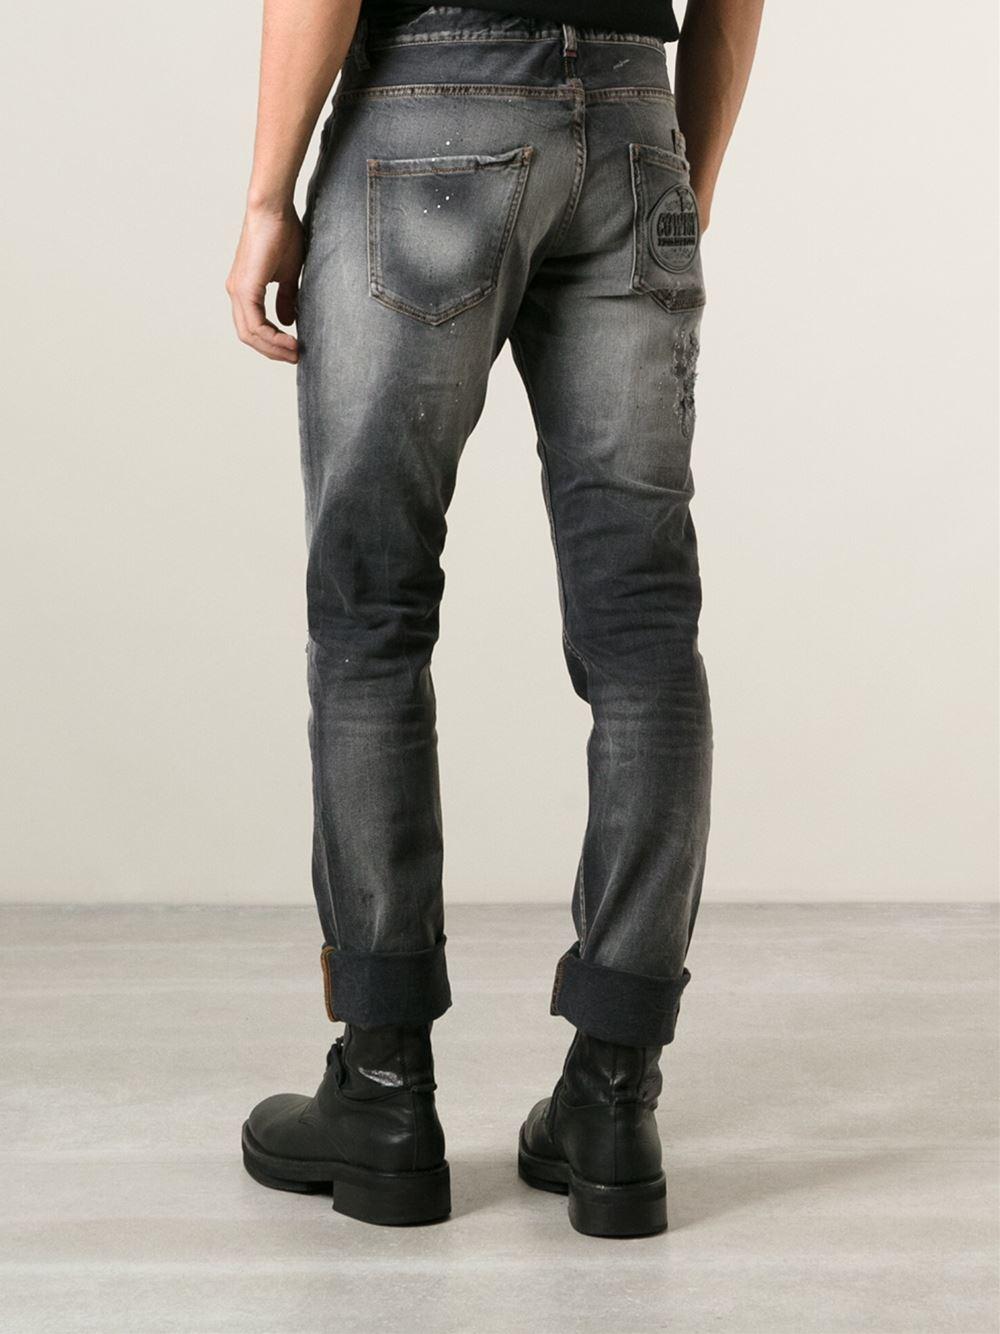 Philipp Plein Cowboy Jeans in Black for Men